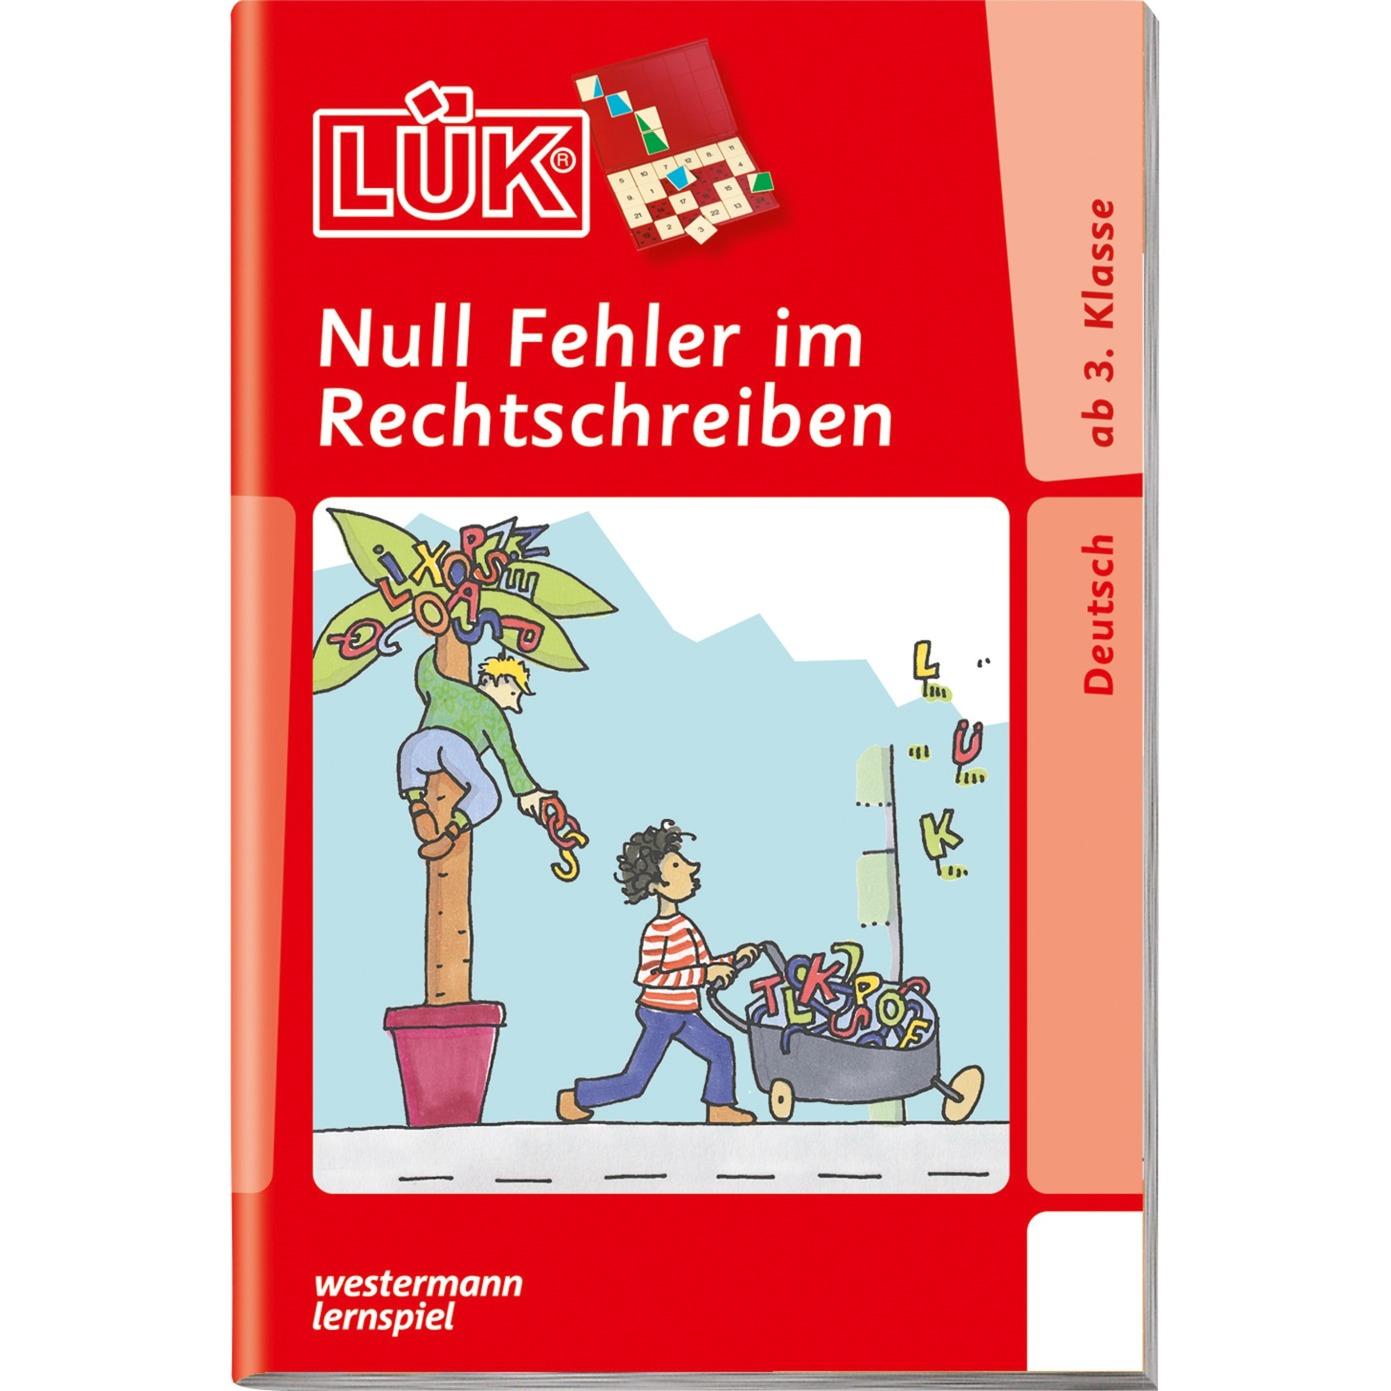 Null Fehler im Rechtschreiben livre pour enfants, Manuel